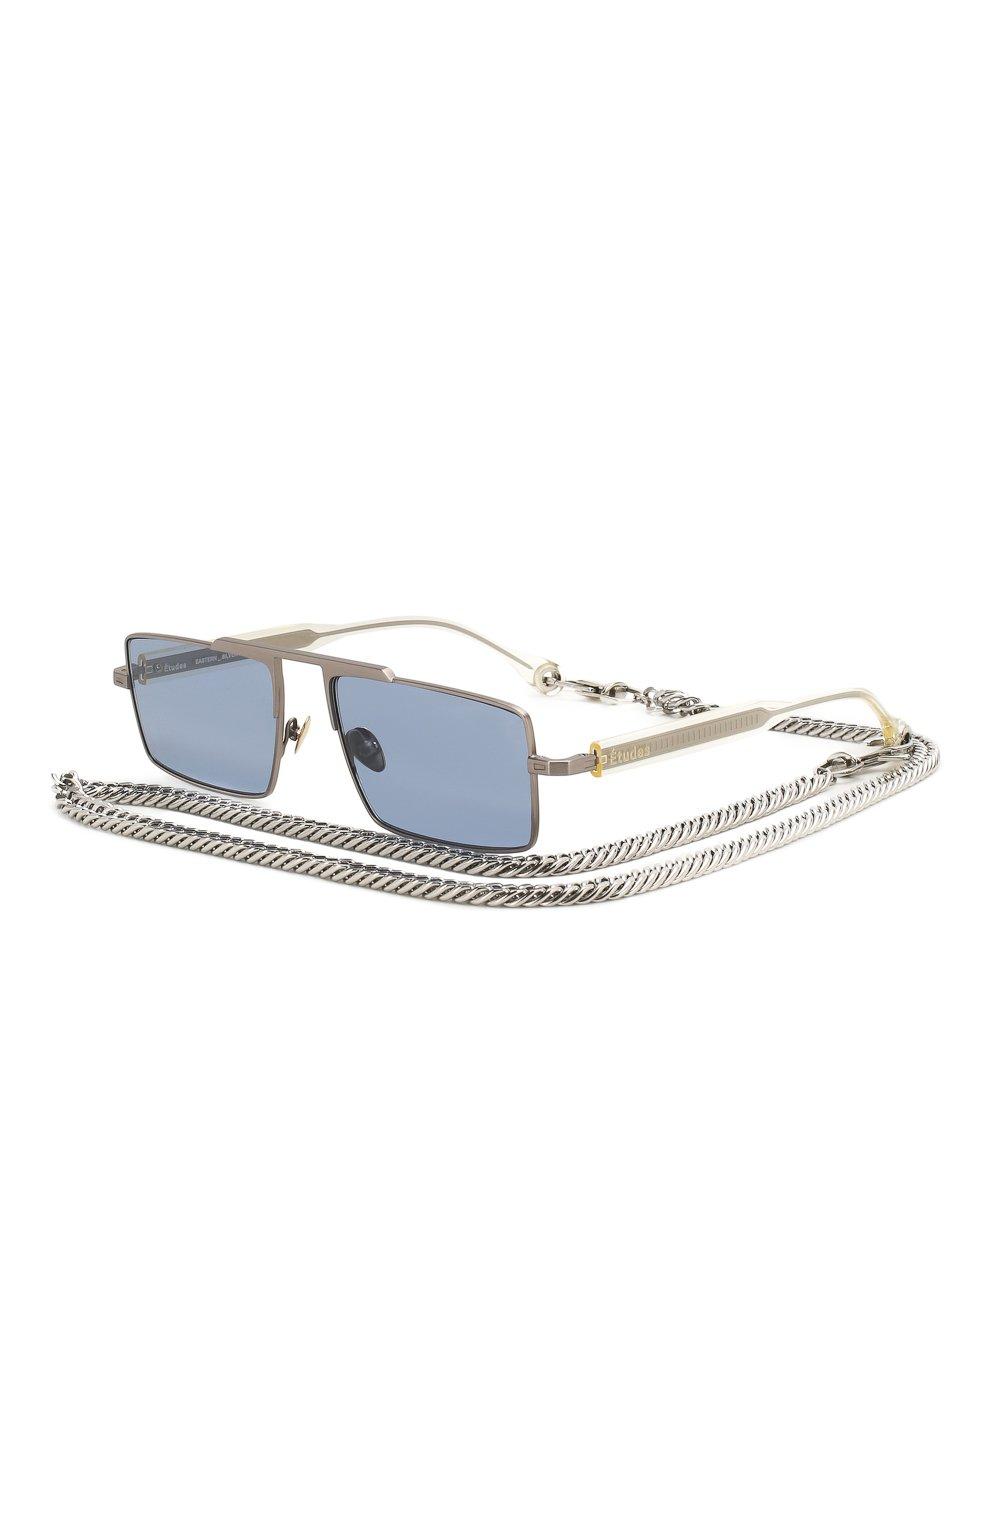 Женские солнцезащитные очки ÉTUDES серебряного цвета, арт. EASTERN SILVER CH WITH CHAIN   Фото 1